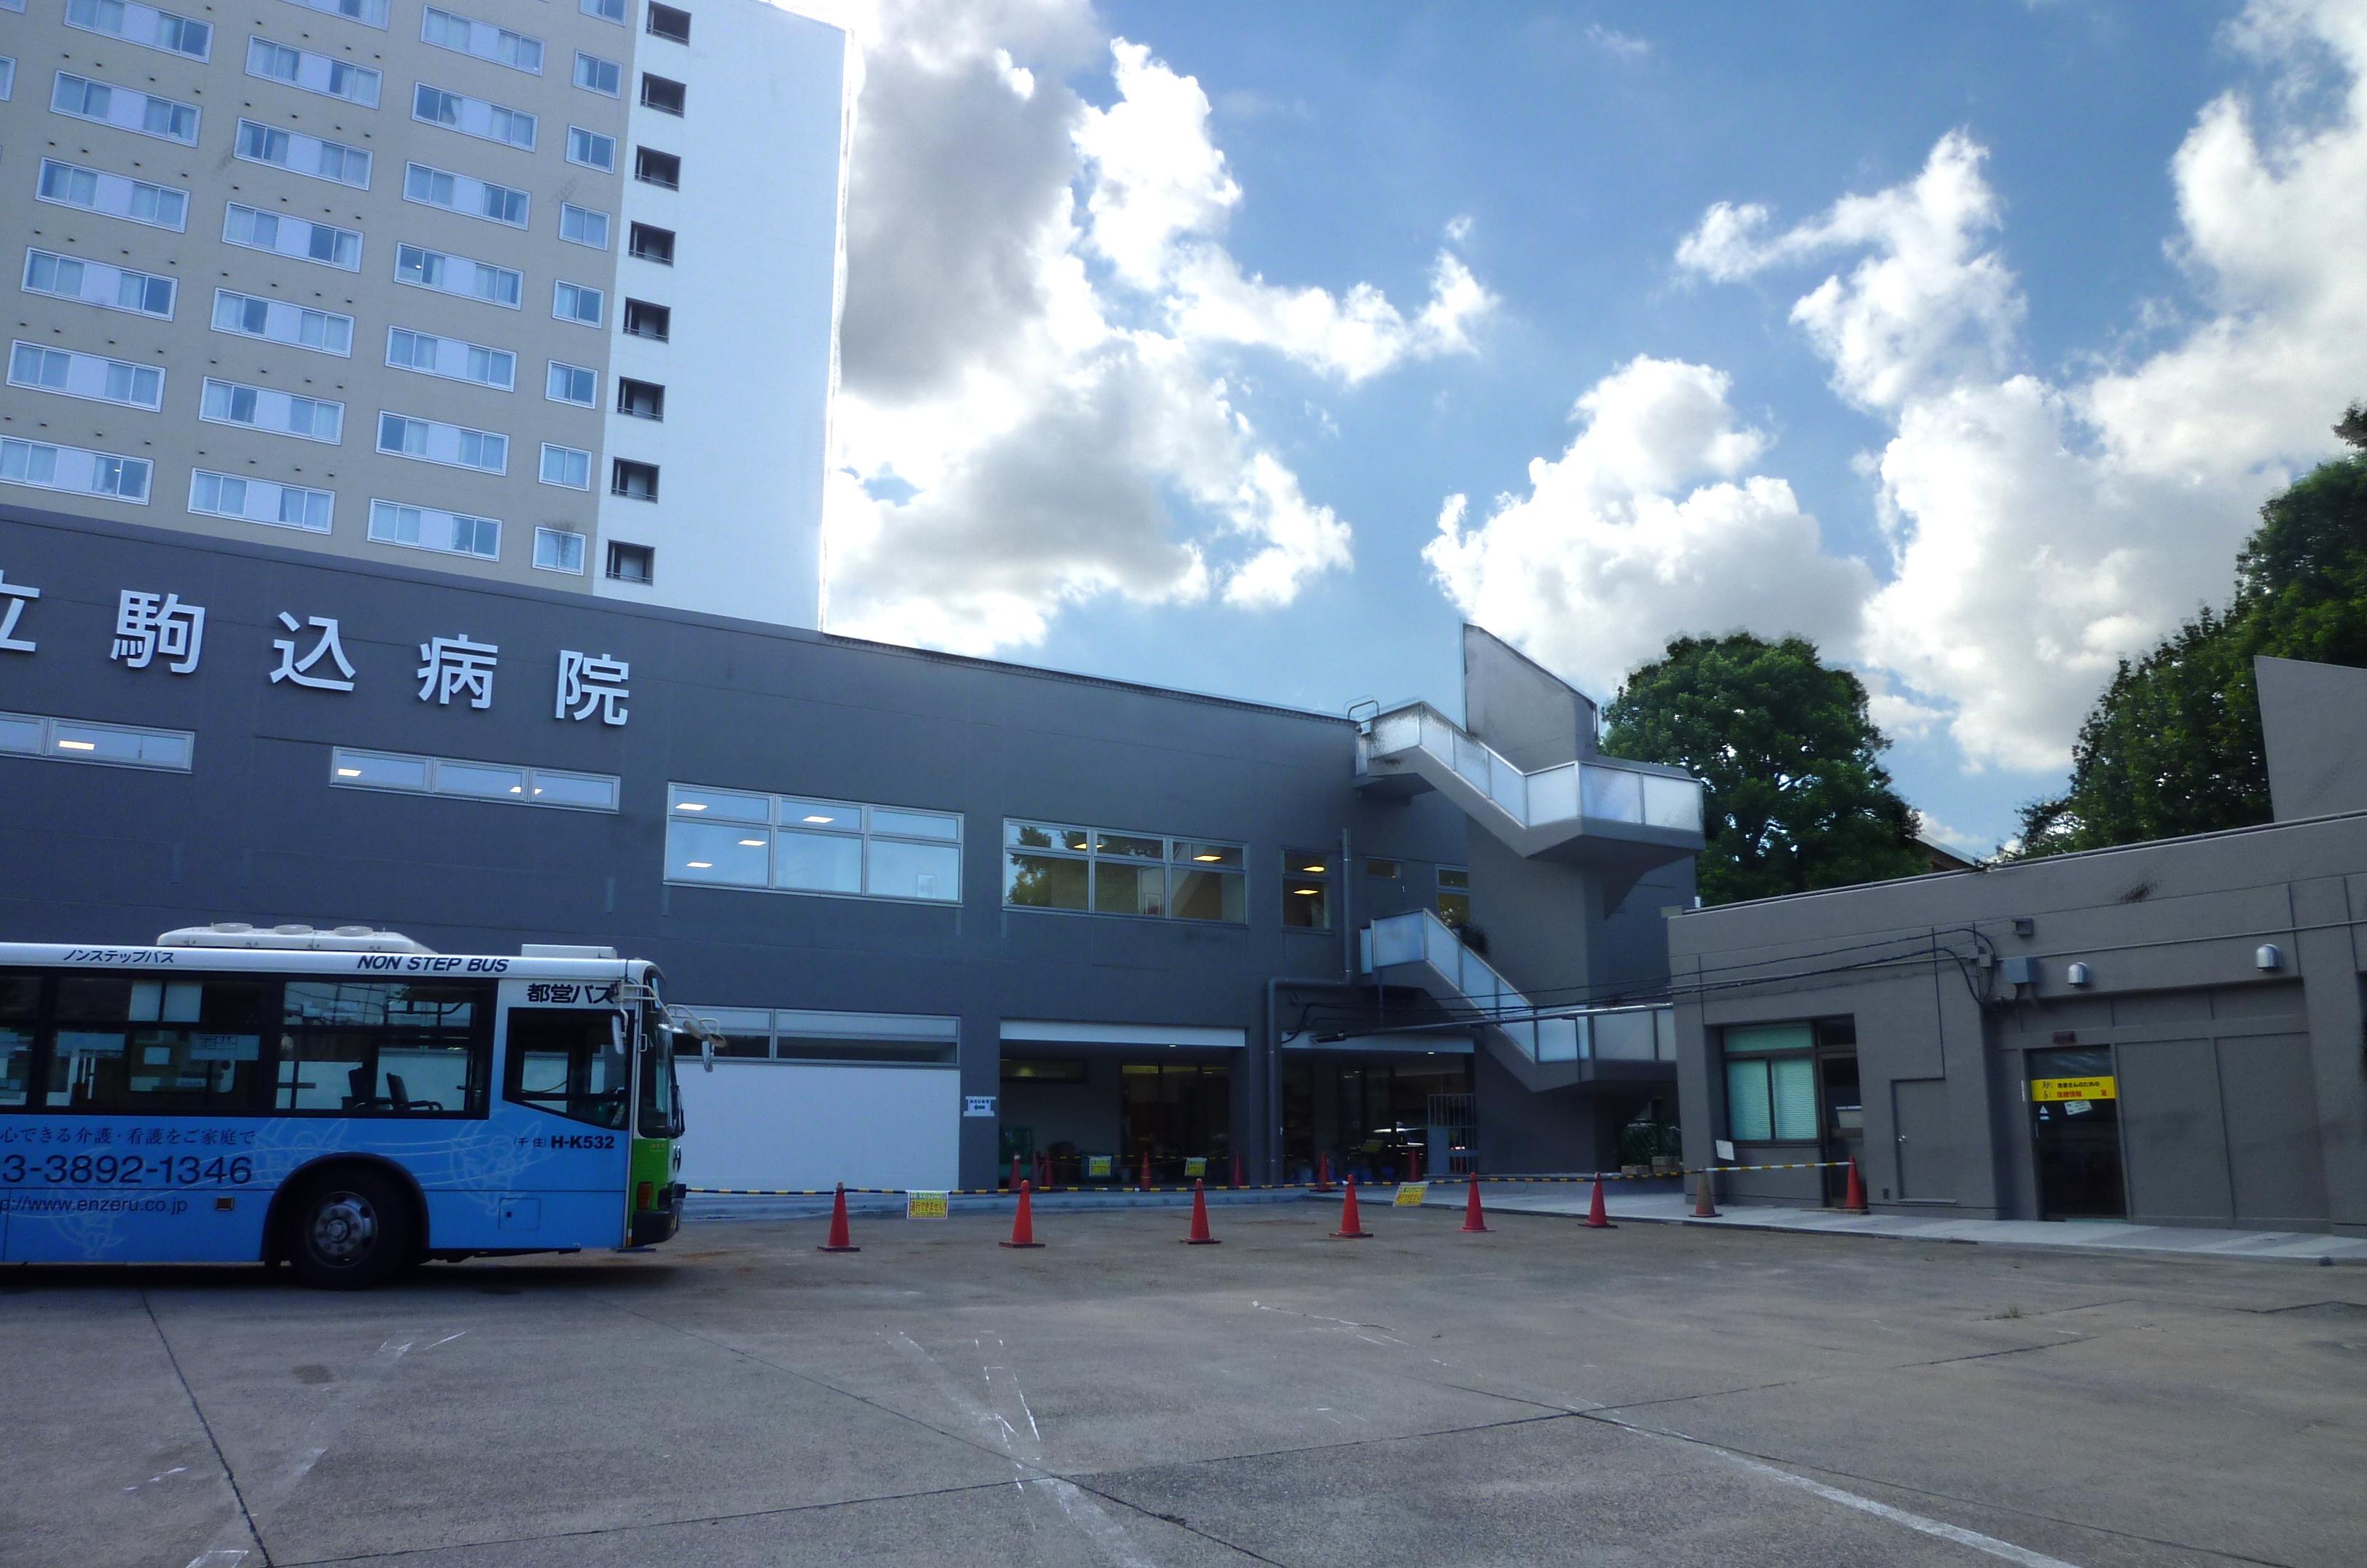 都立 駒込 病院 がん・感染症センター駒込病院 東京都病院経営本部